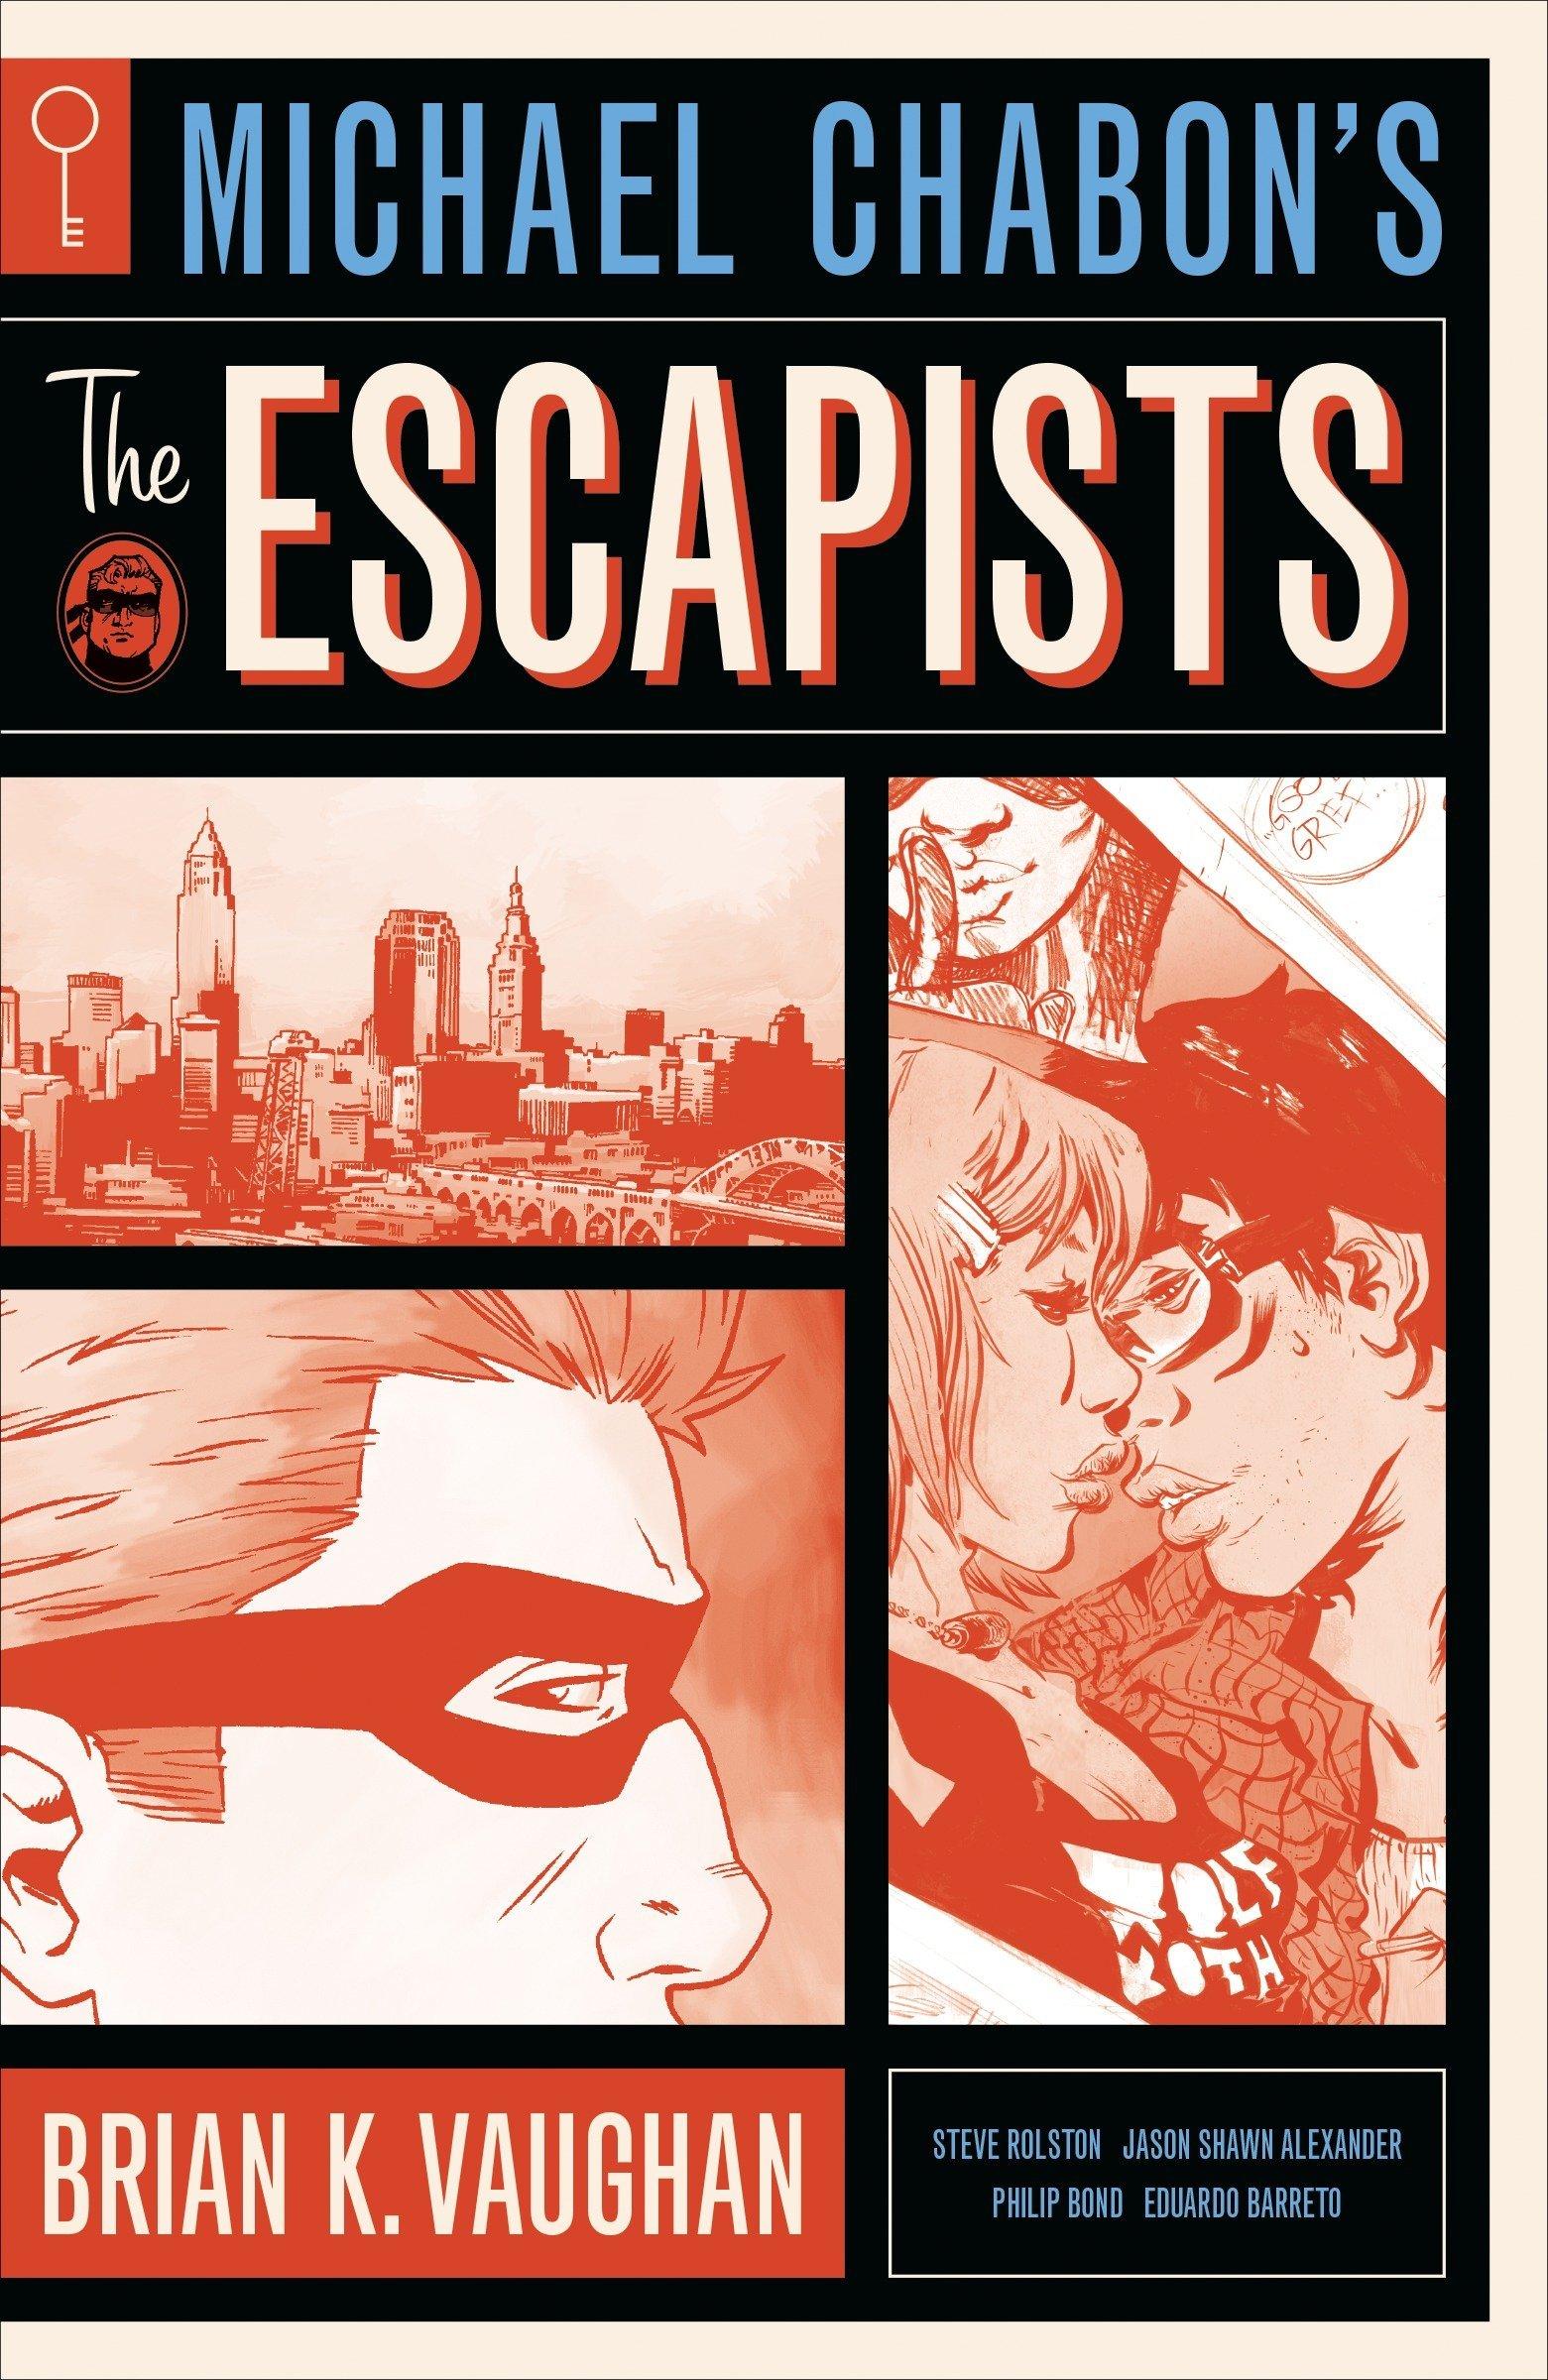 Michael Chabon's The Escapists ebook